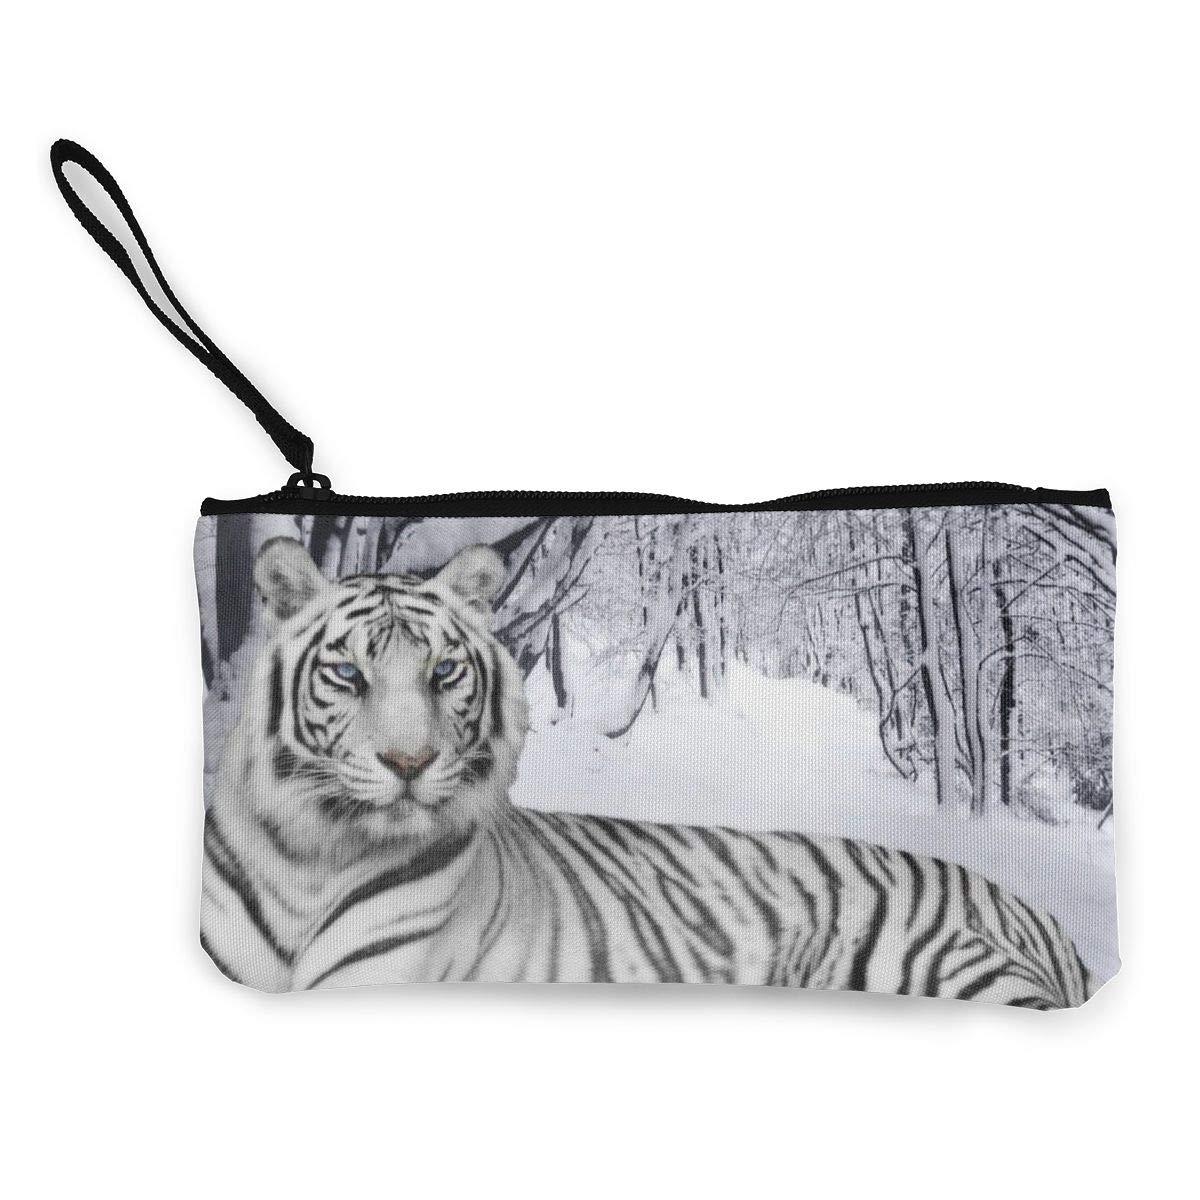 Canvas Cash Coin Purse,White Tiger Print Make Up Bag Zipper Small Purse Wallets